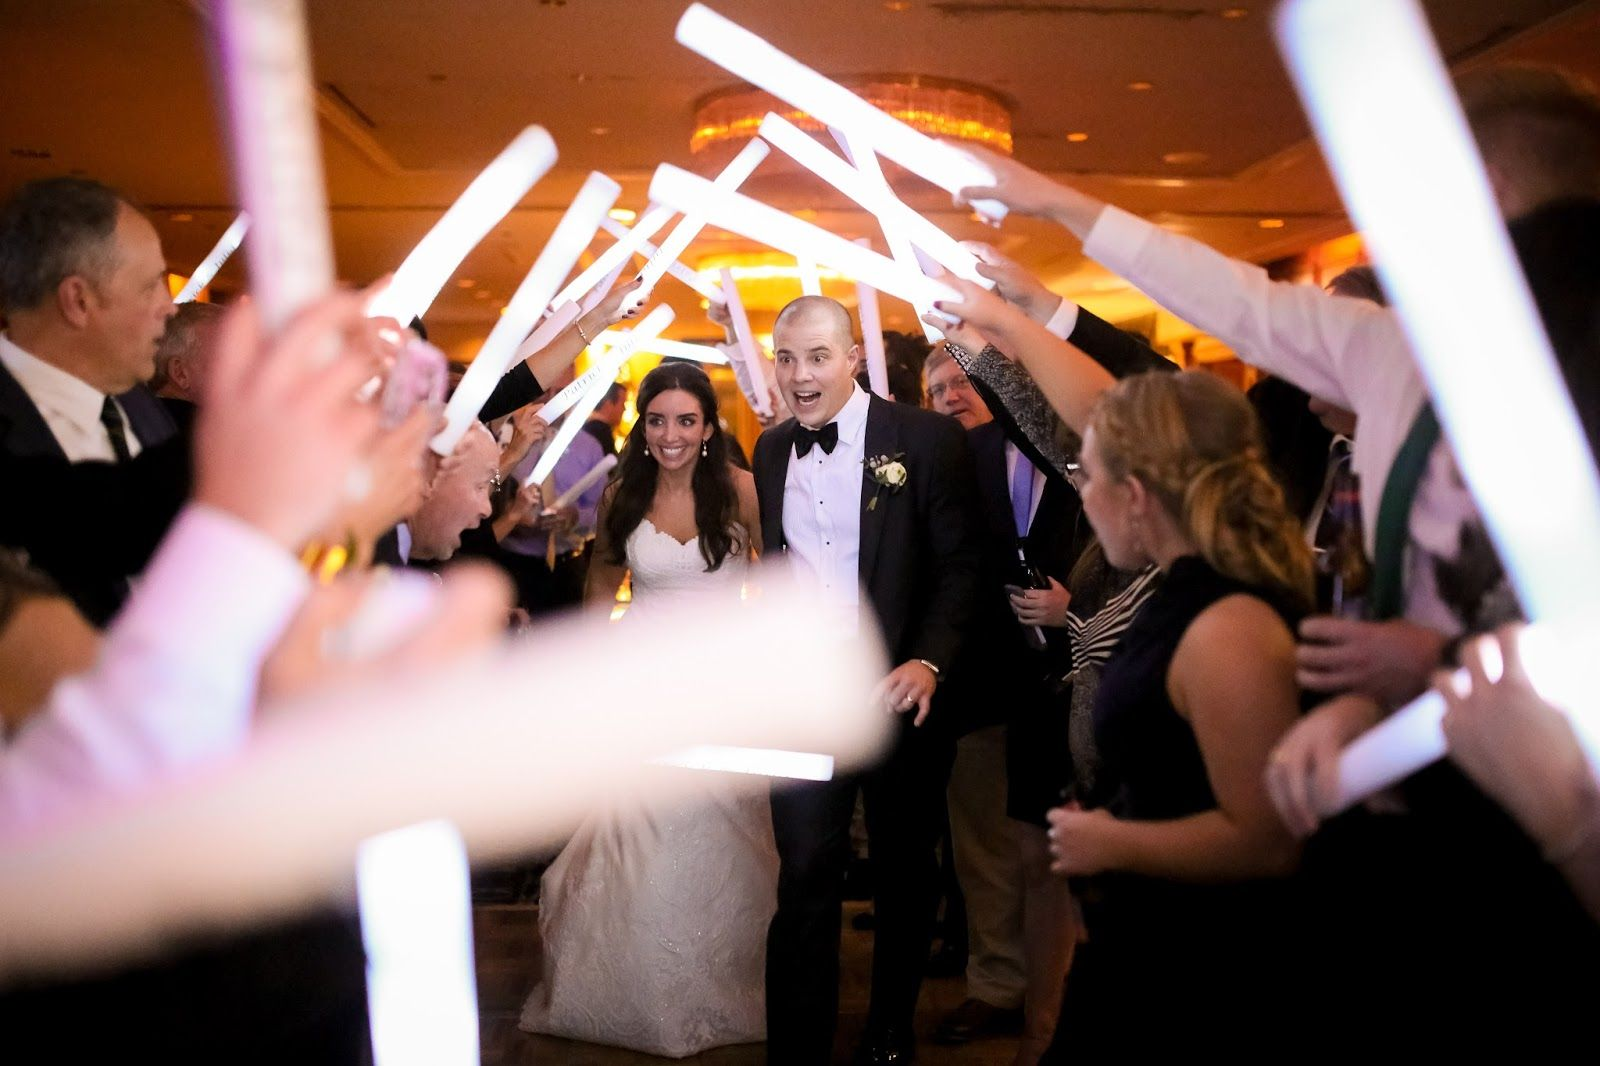 Led Foam Wands Light Sticks For The Wedding Send Off Wedding Send Off Glow Stick Wedding Wedding